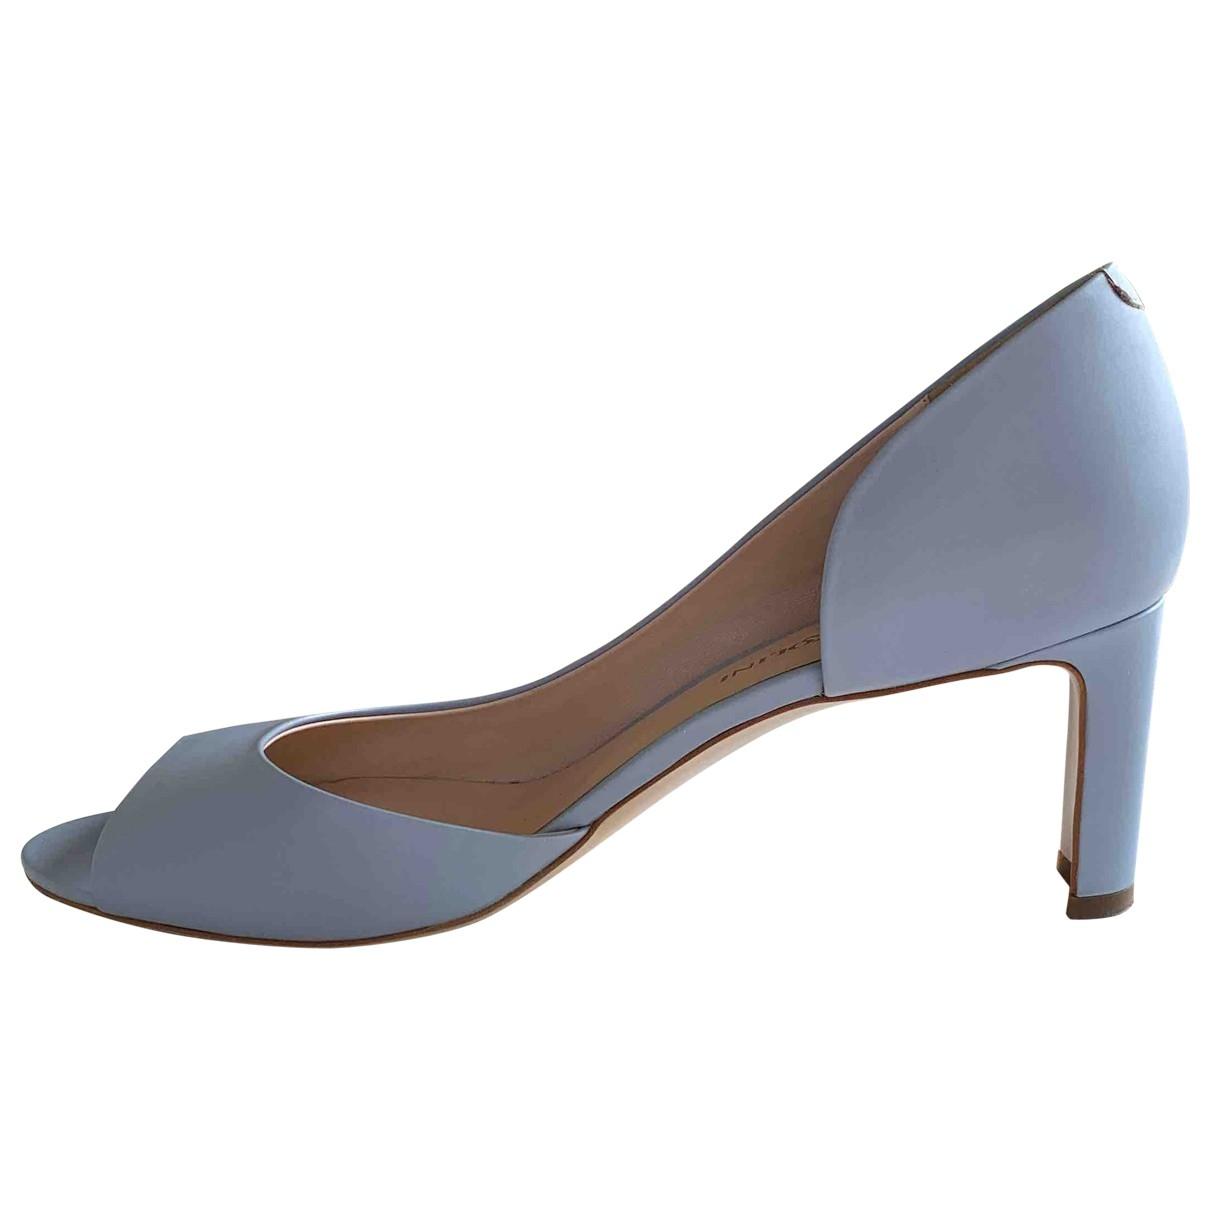 Carlo Pazolini \N Leather Heels for Women 38 EU